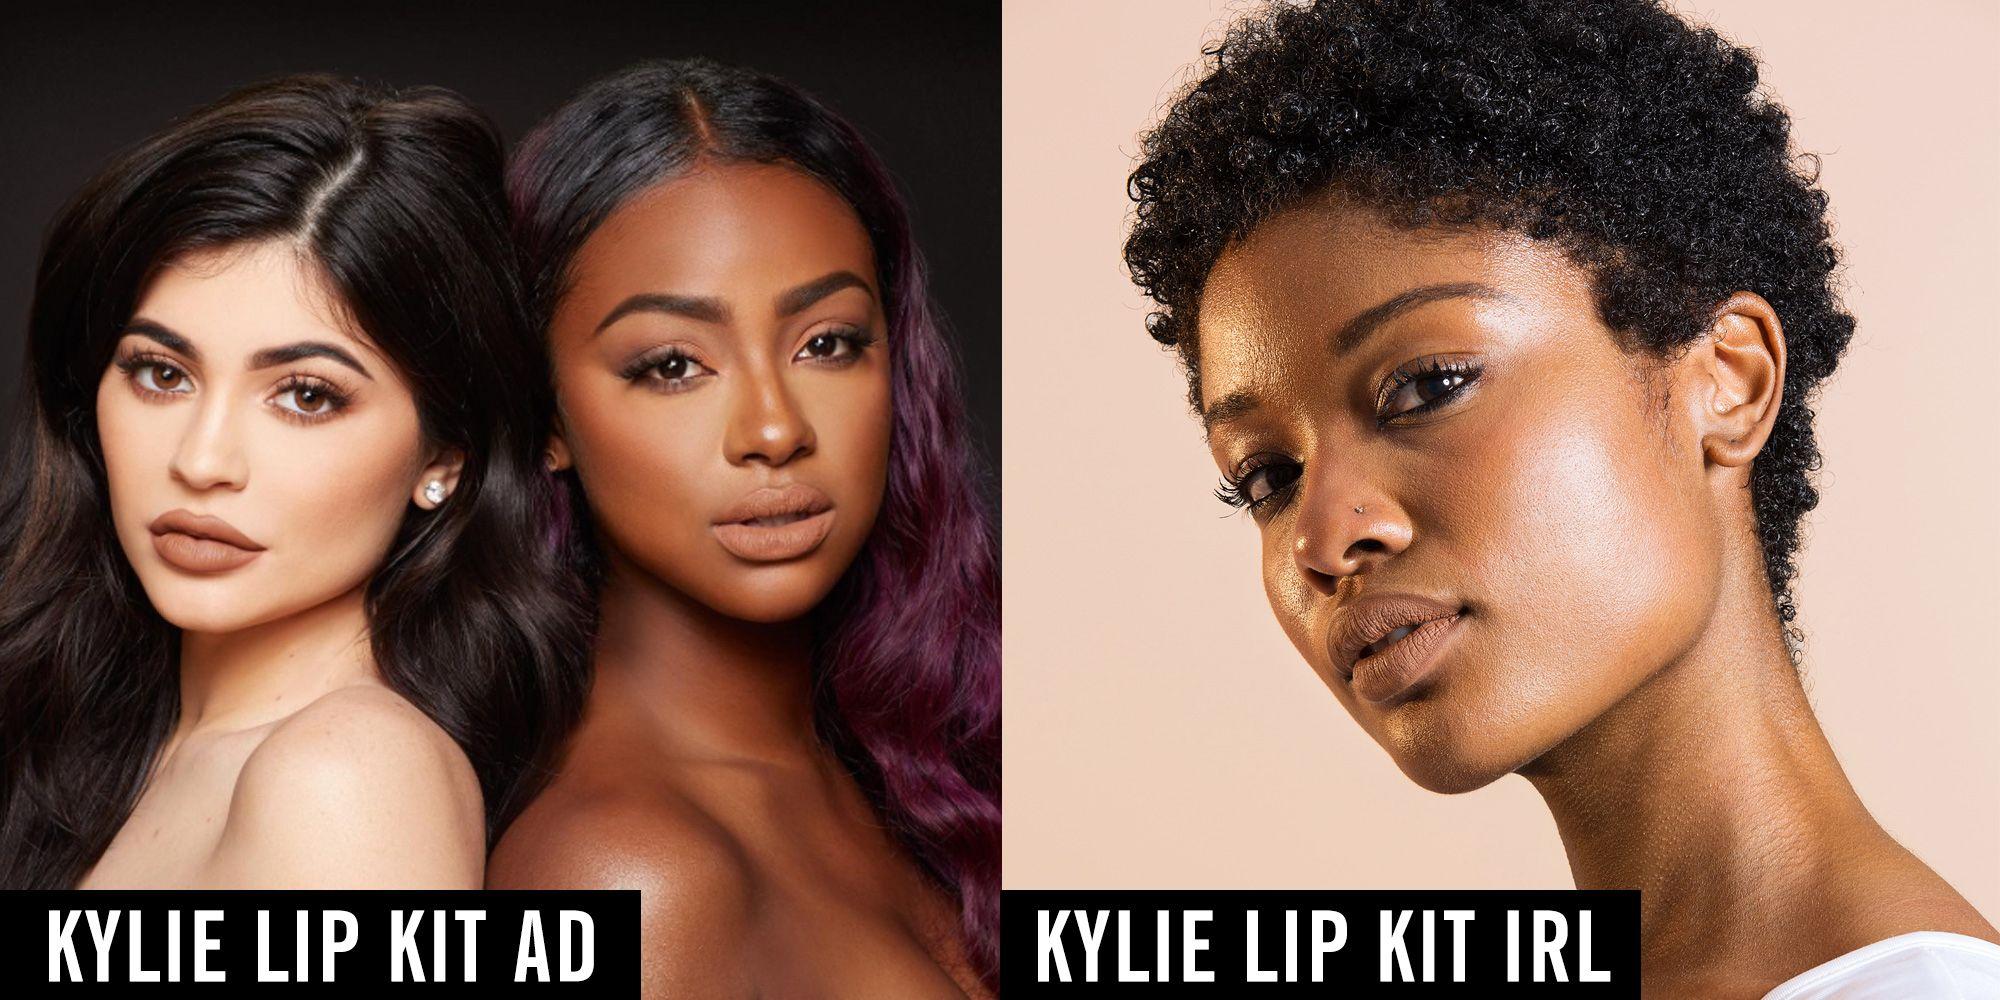 Kylie Jenner Dark Skin